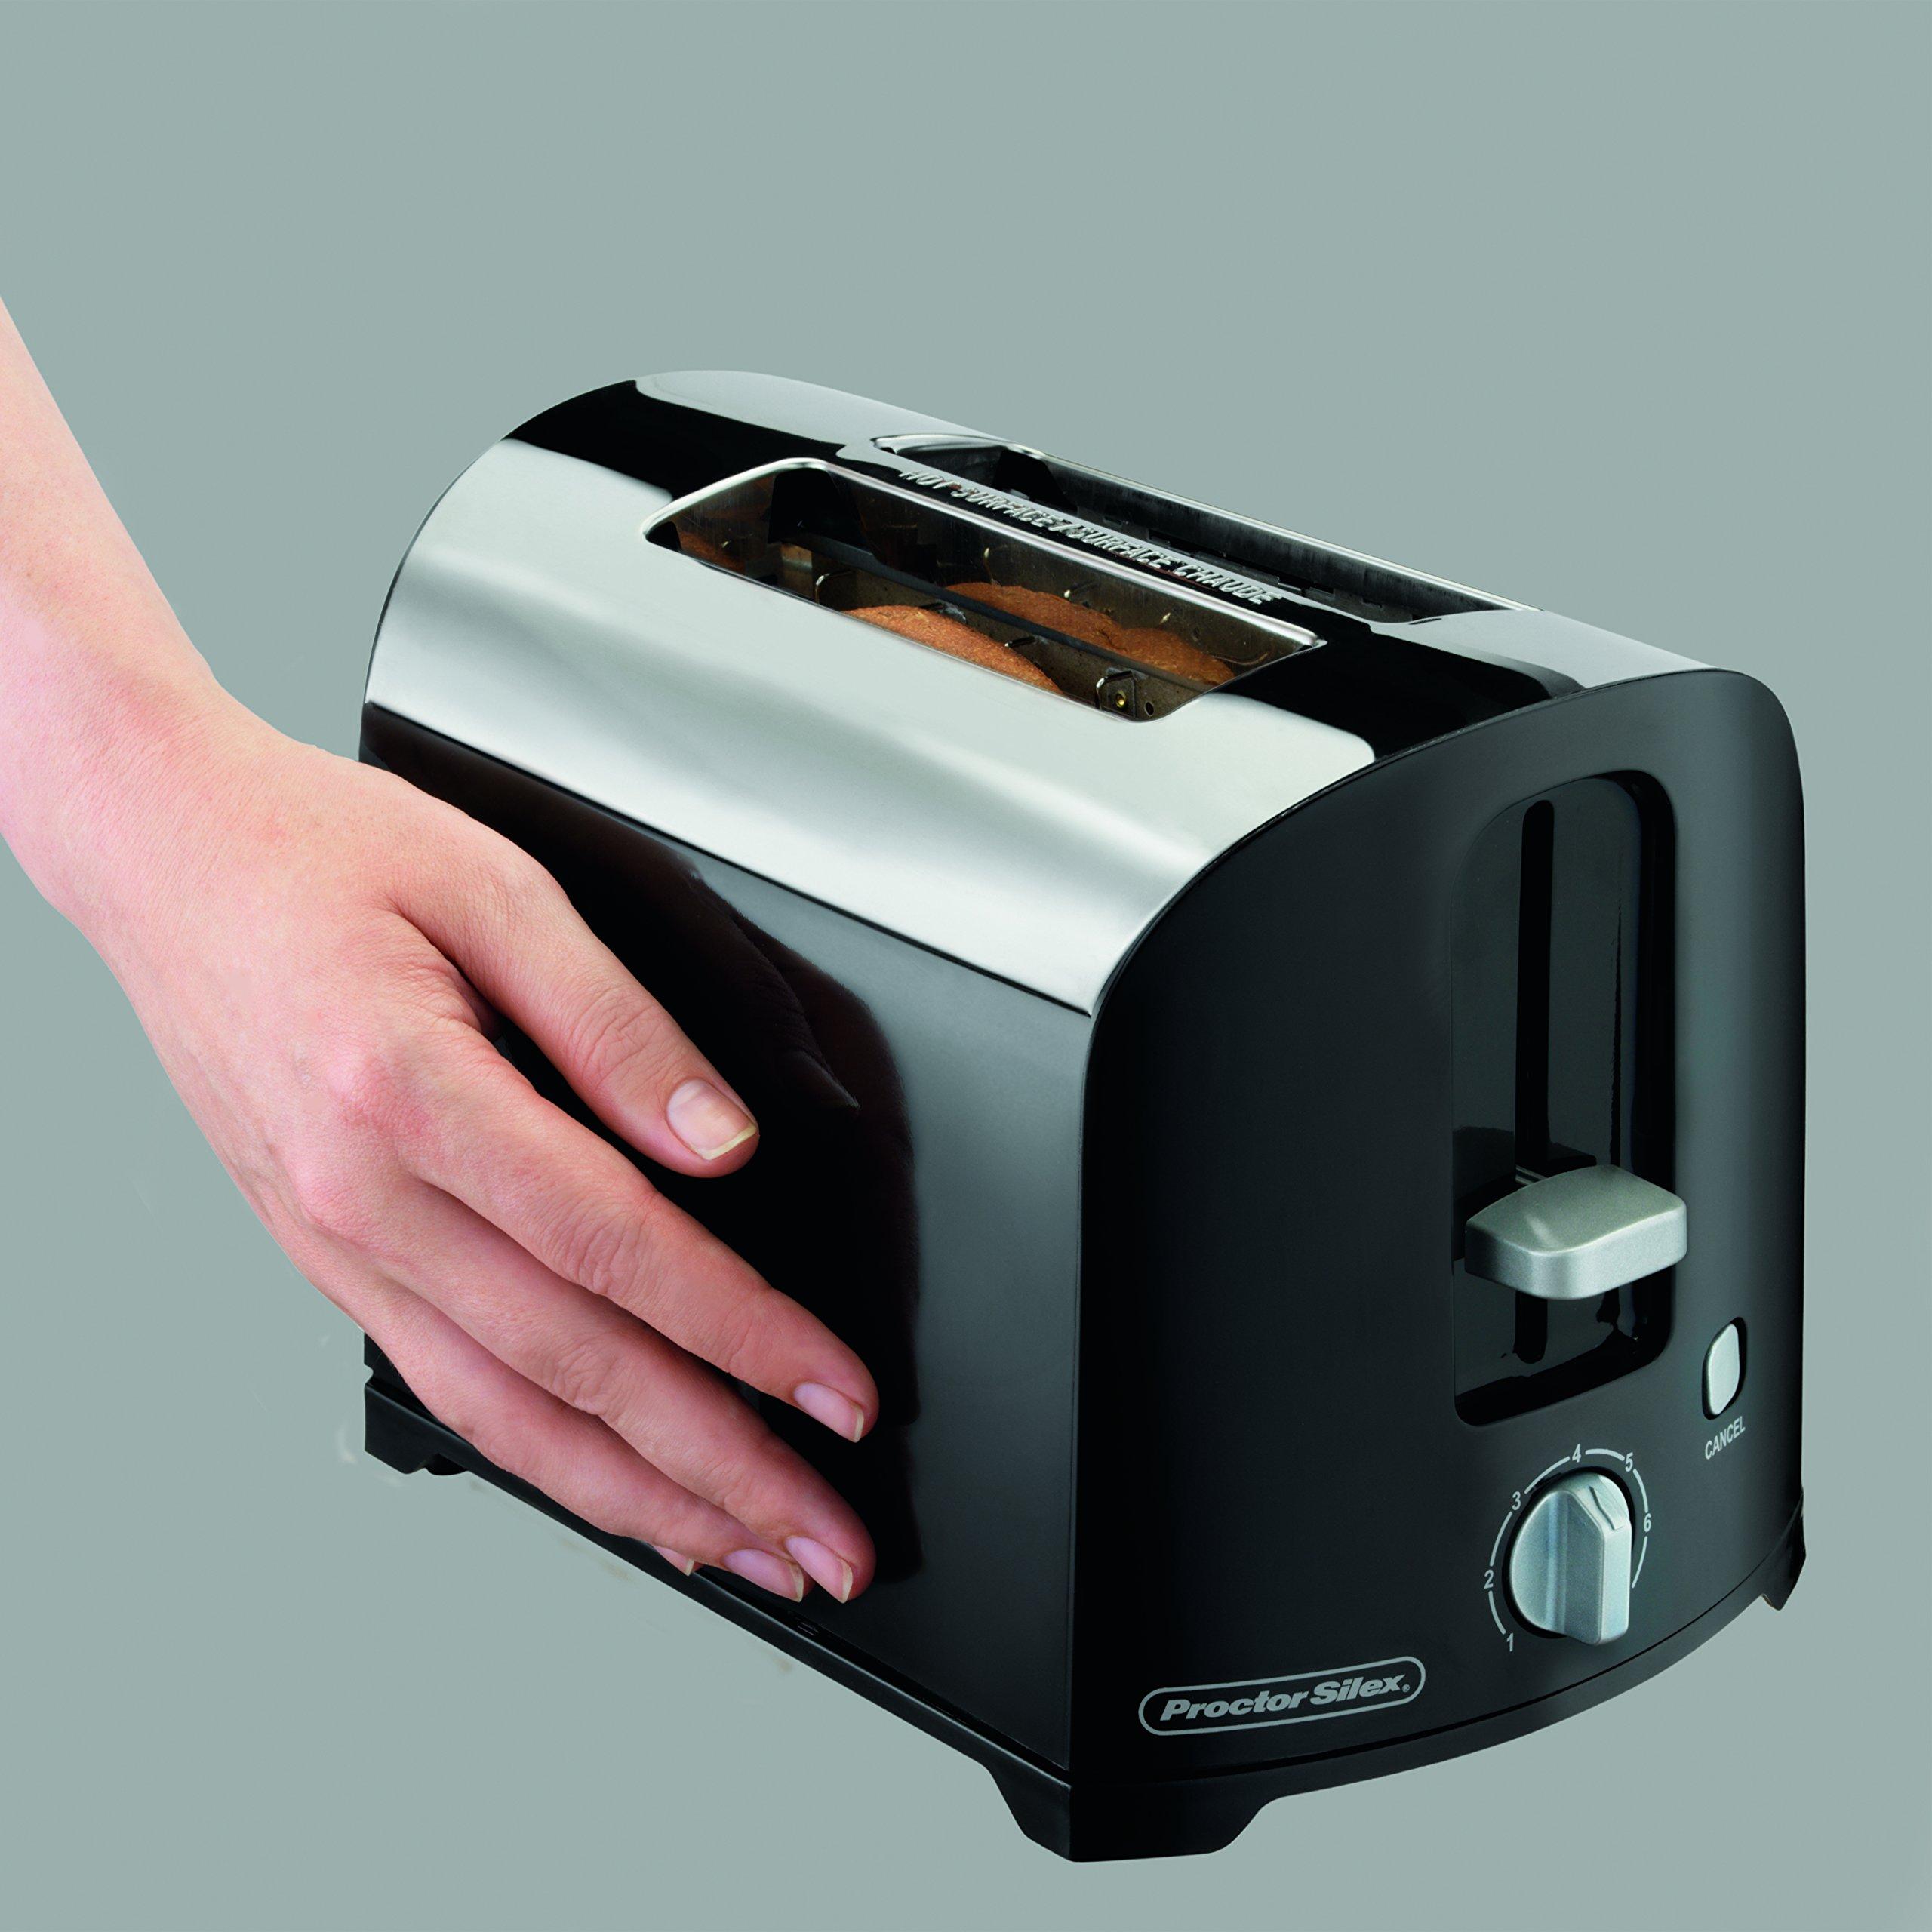 Applica/Spectrum Brands 22622 2 Slice Chrome Toaster, Black